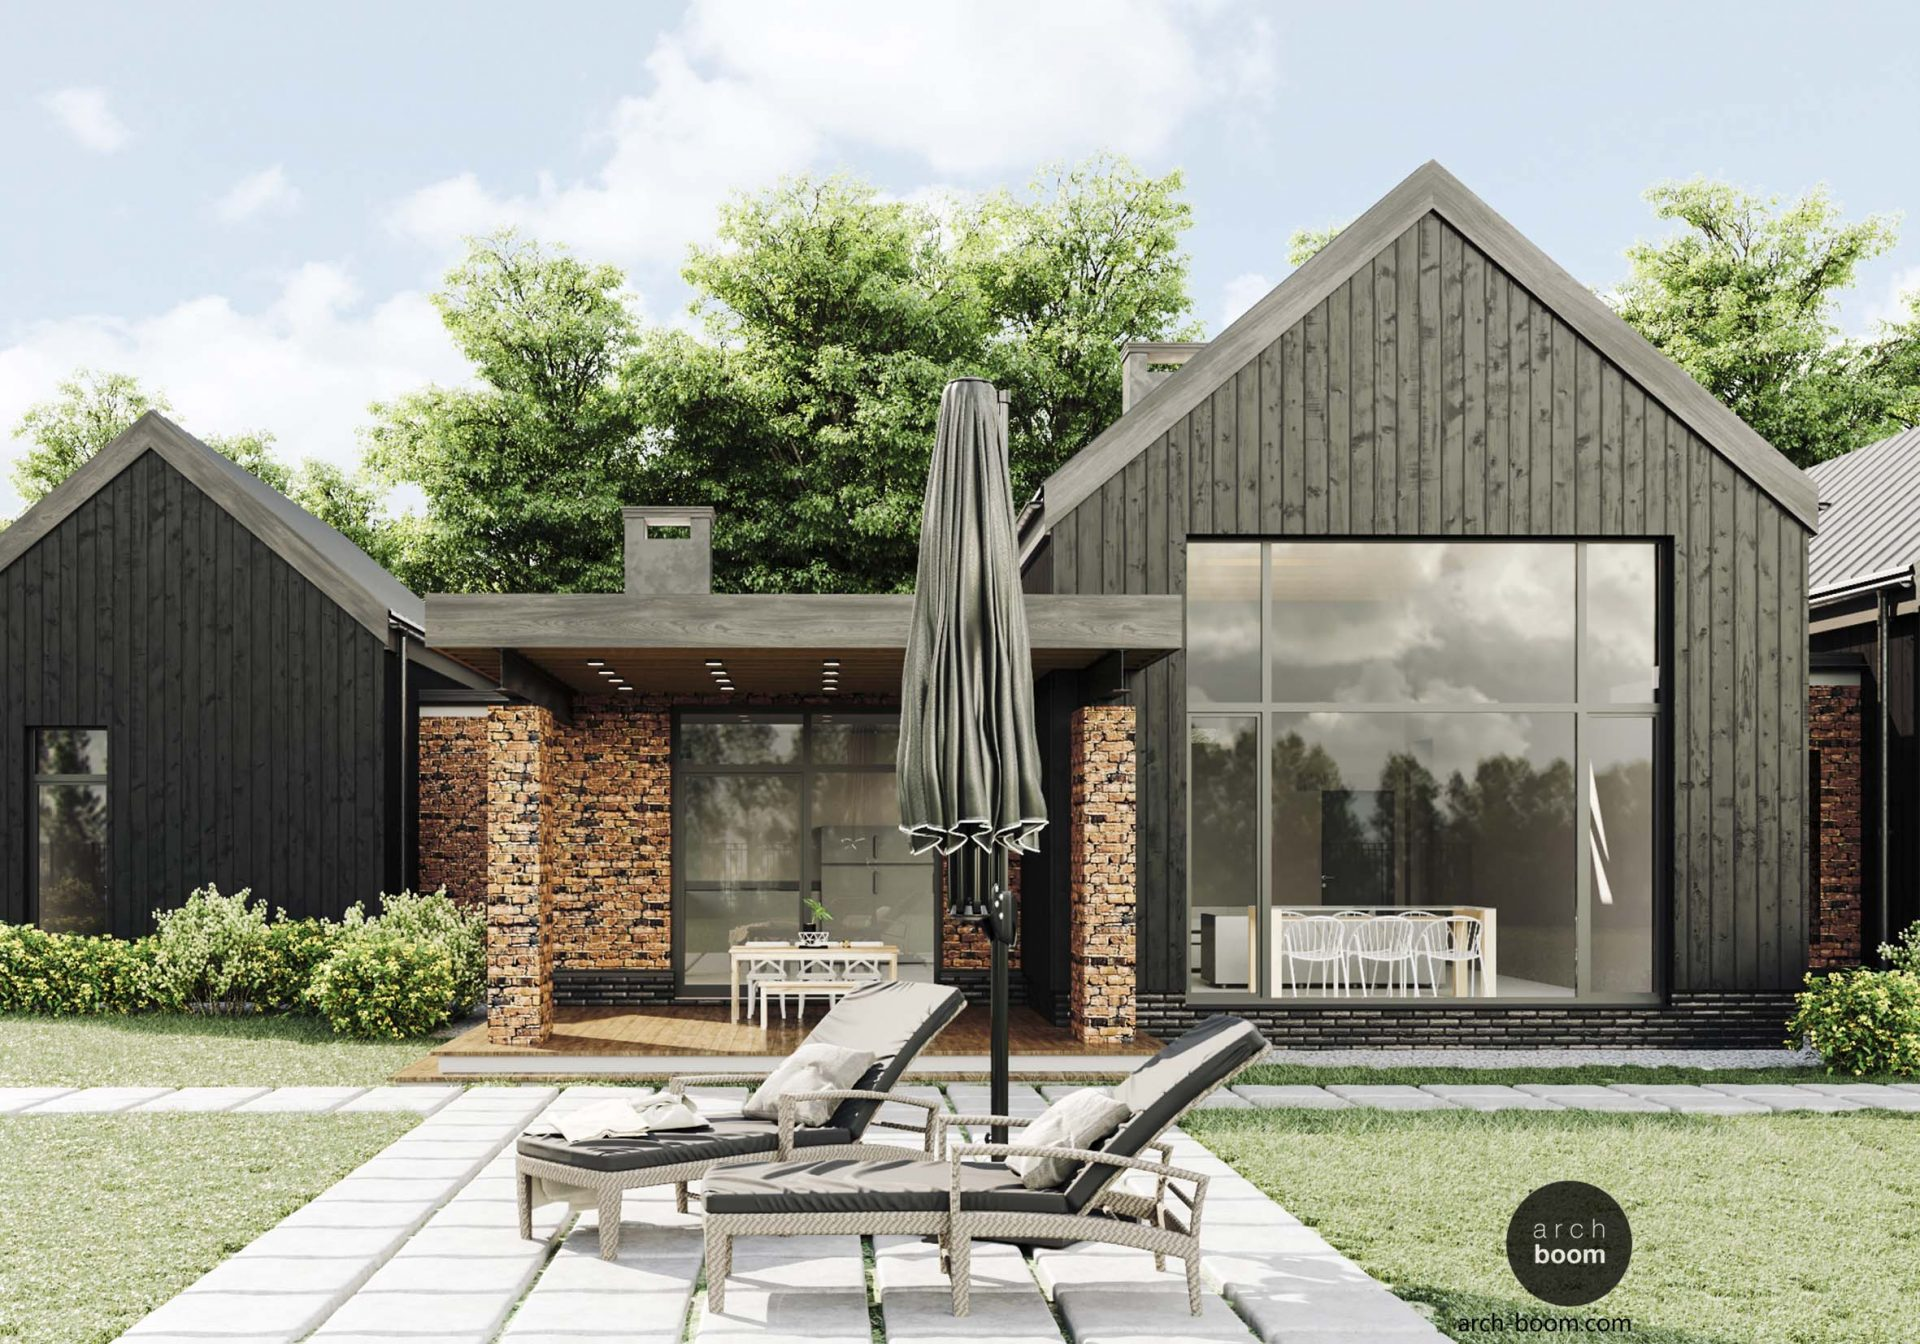 barn house projekt domu z opalonego drewna i cegły